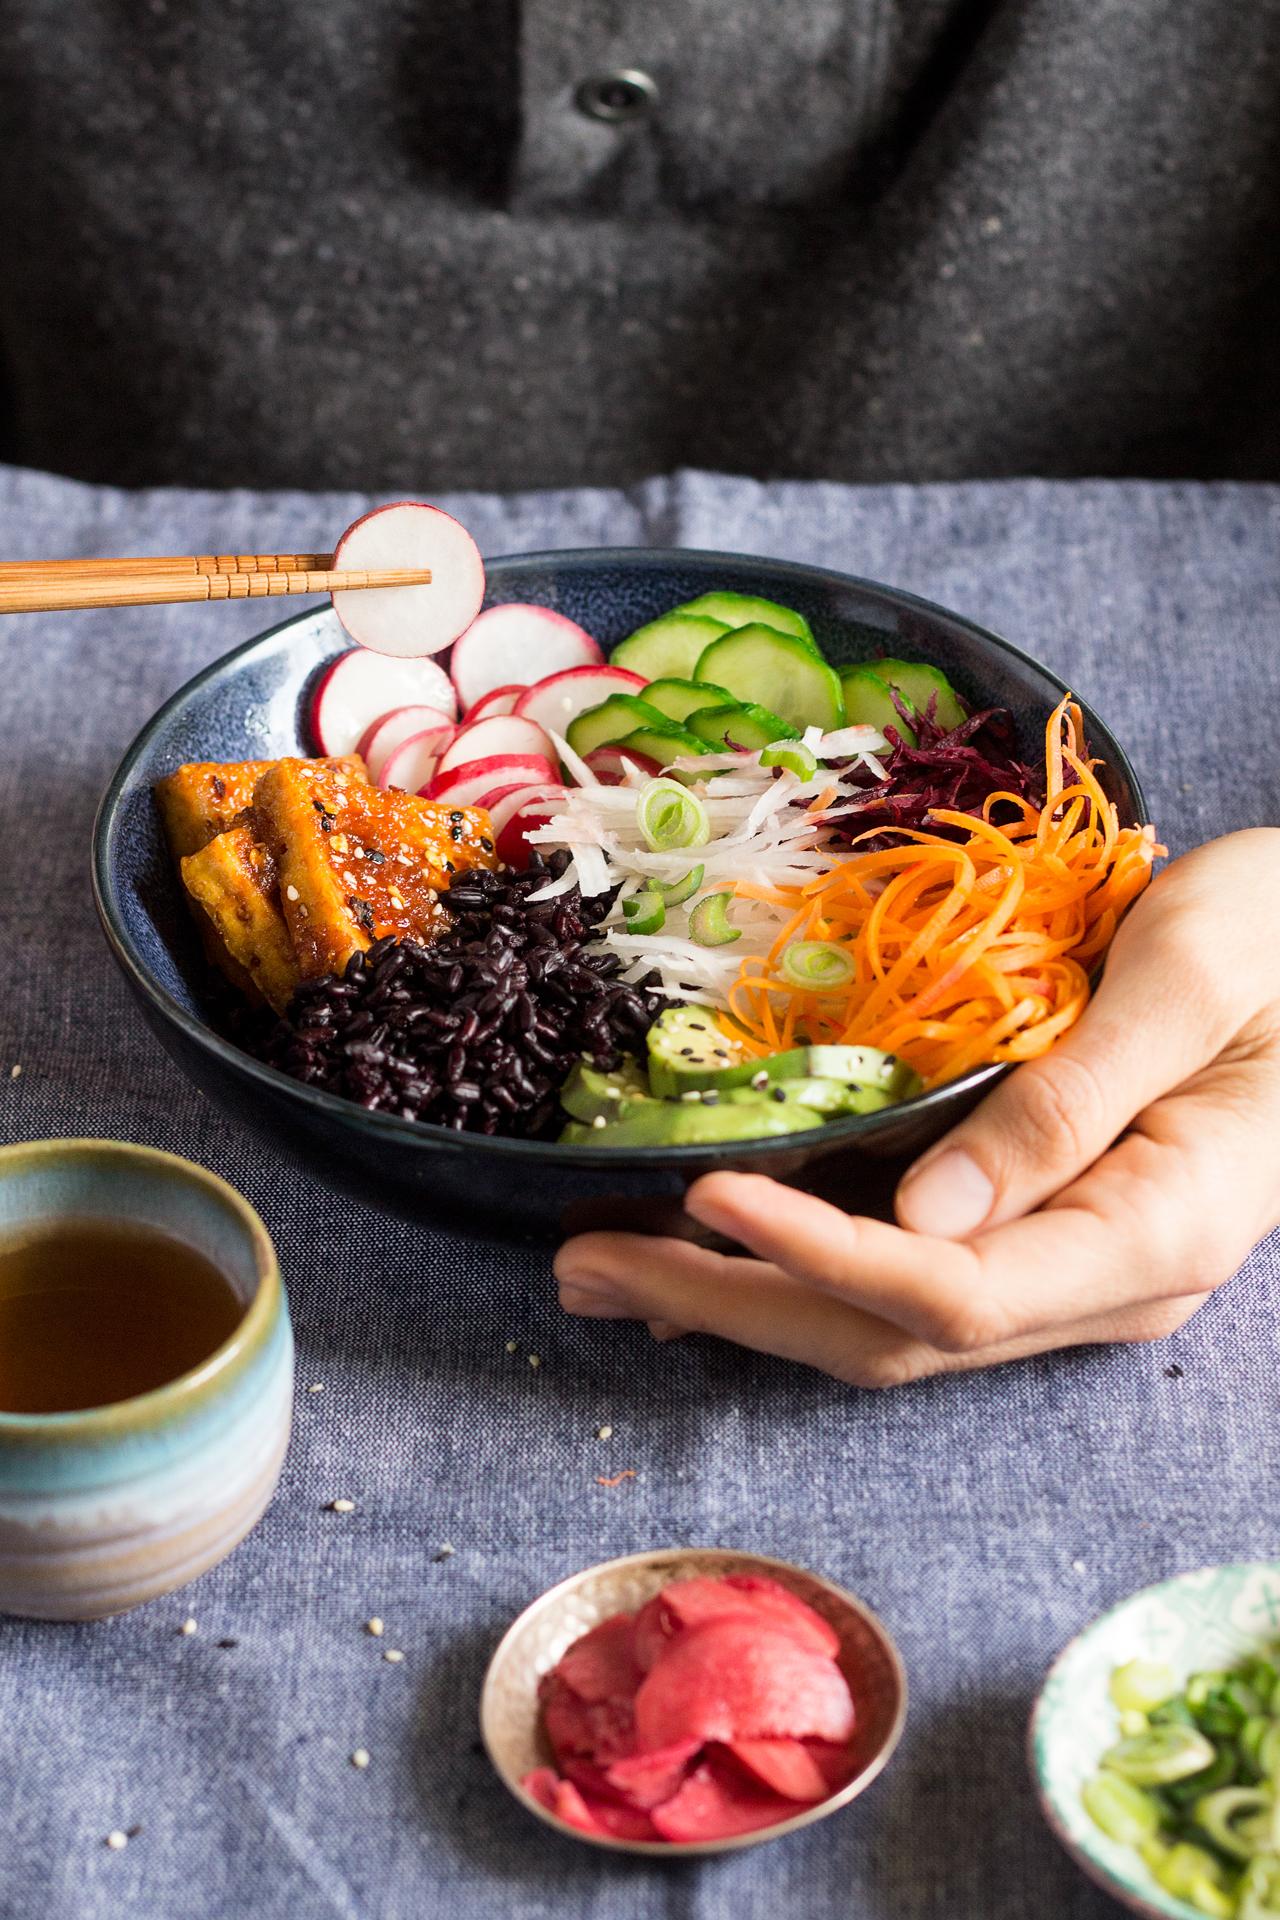 wegańska miseczka sushi porcja